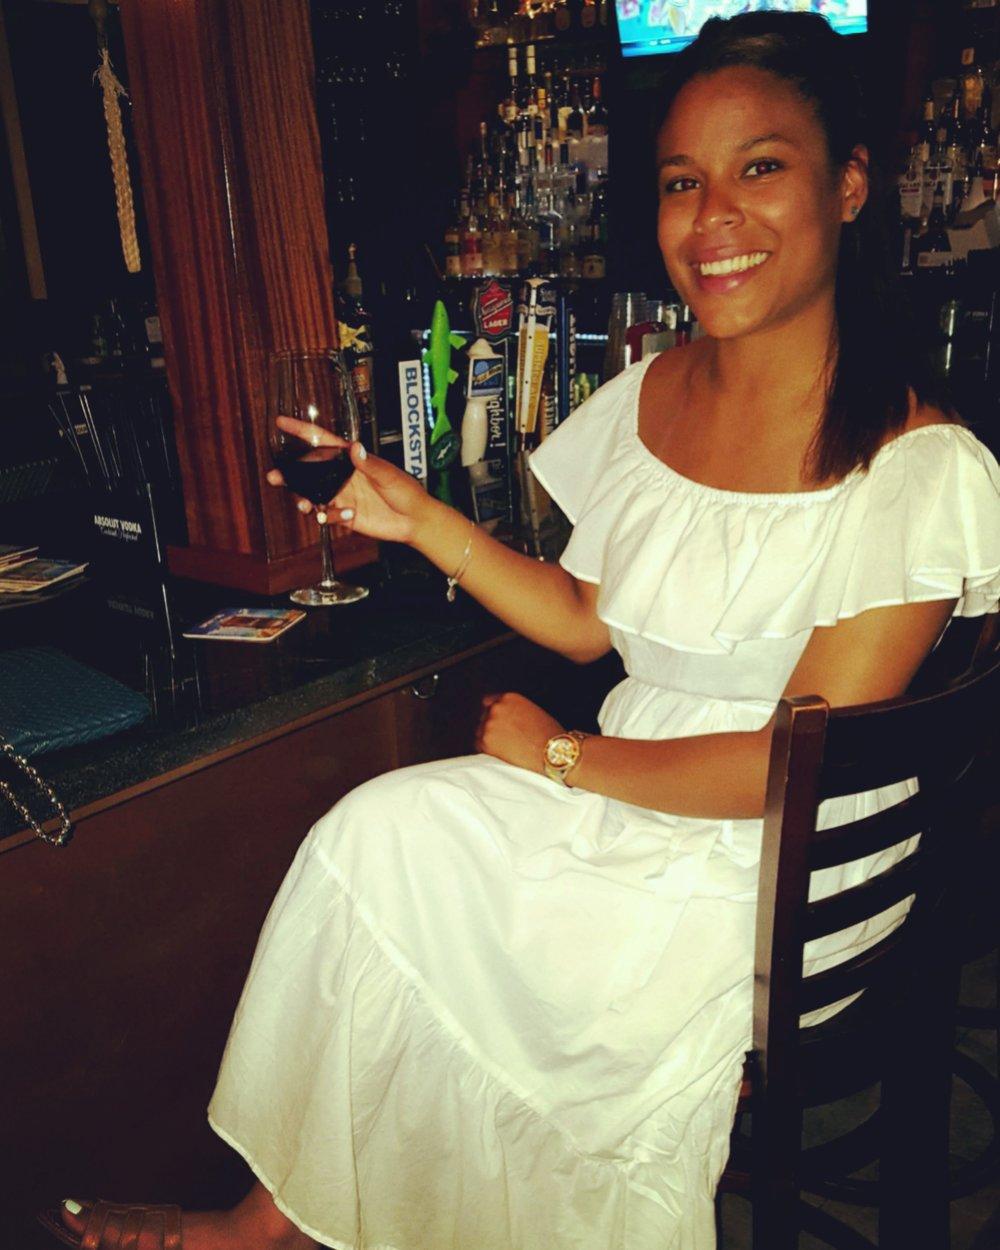 White Dress @ George's of Galilee